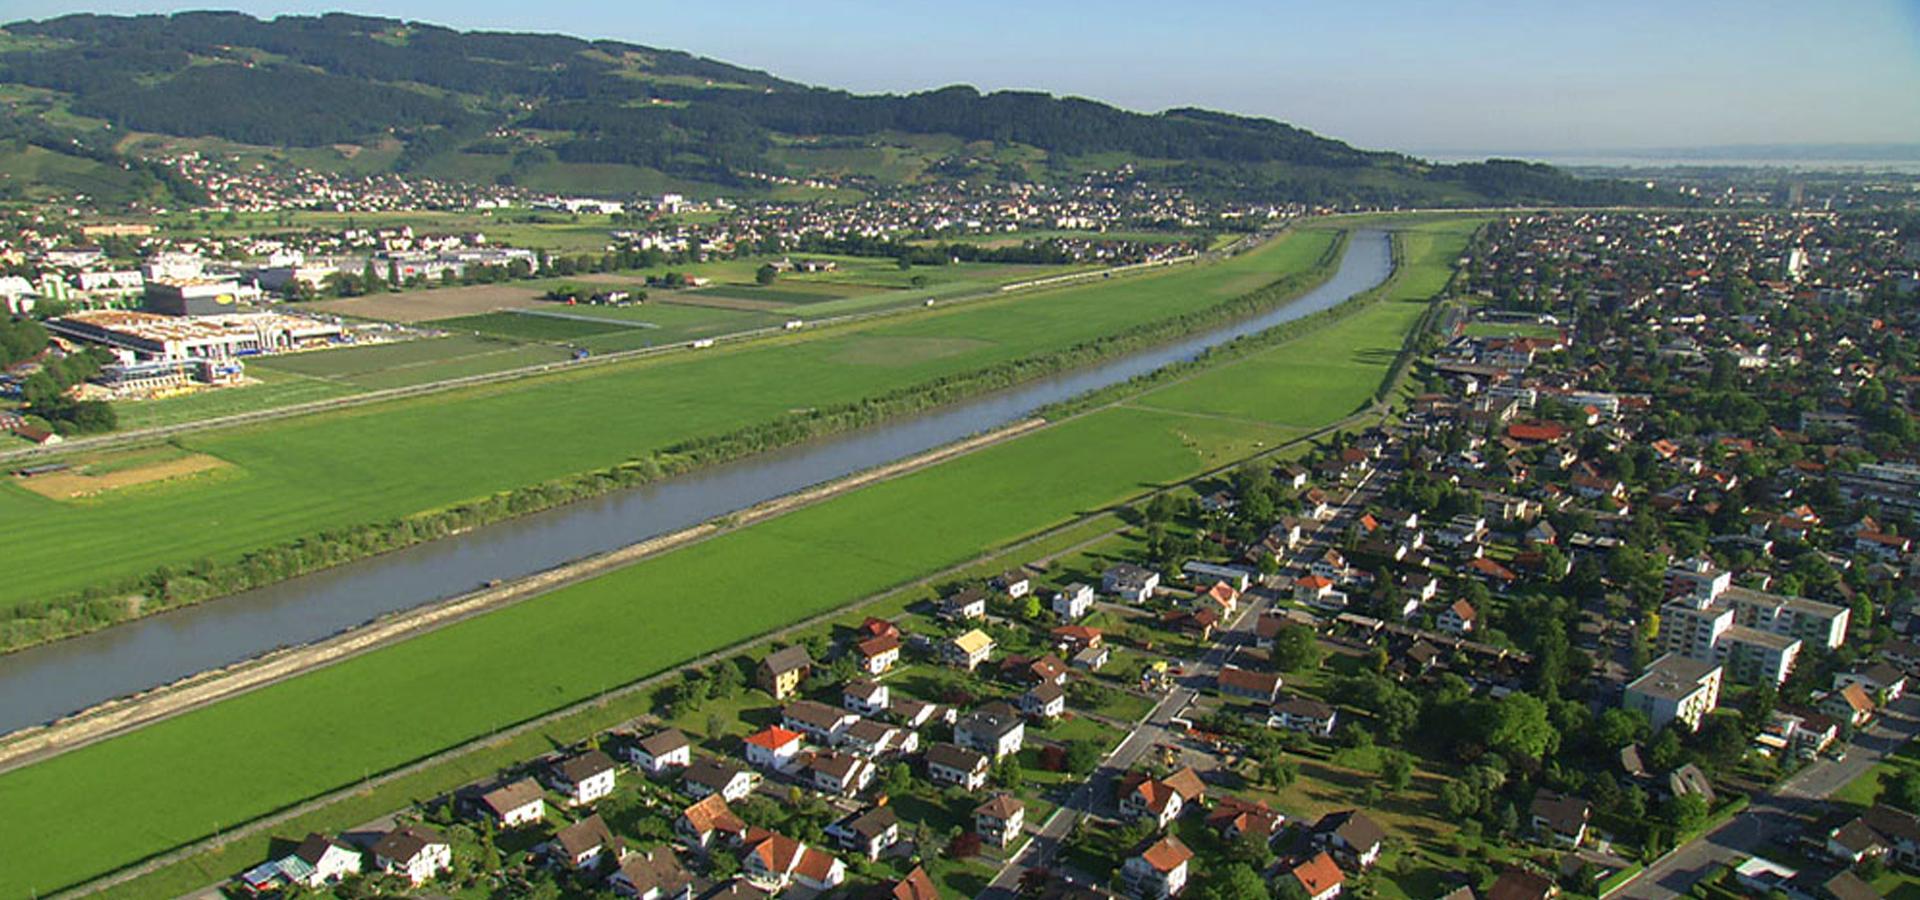 <b>Lustenau, Vorarlberg, Austria</b>